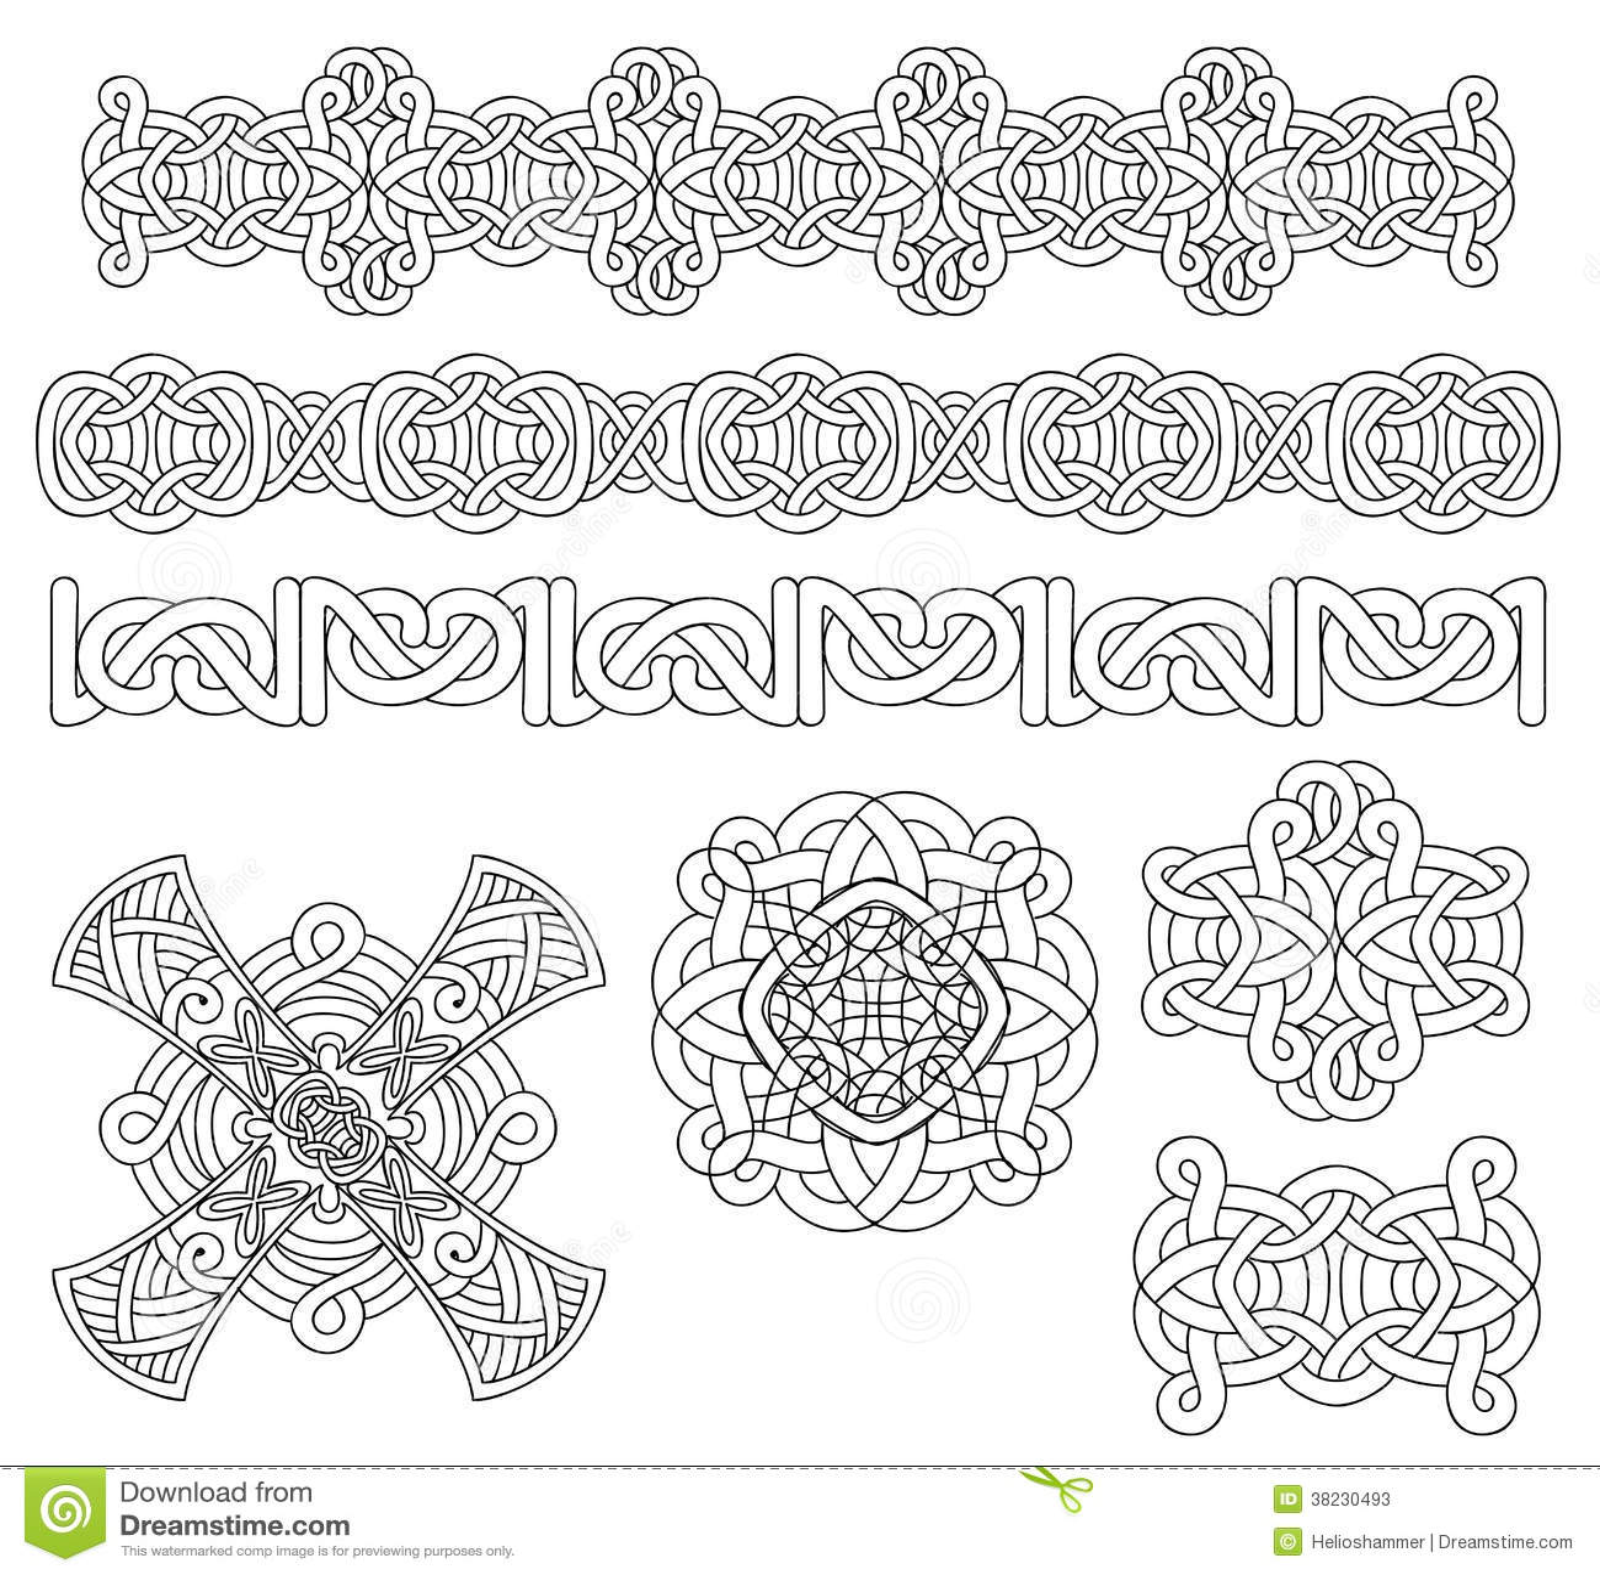 Medieval decoration set stock vector. Illustration of invitations